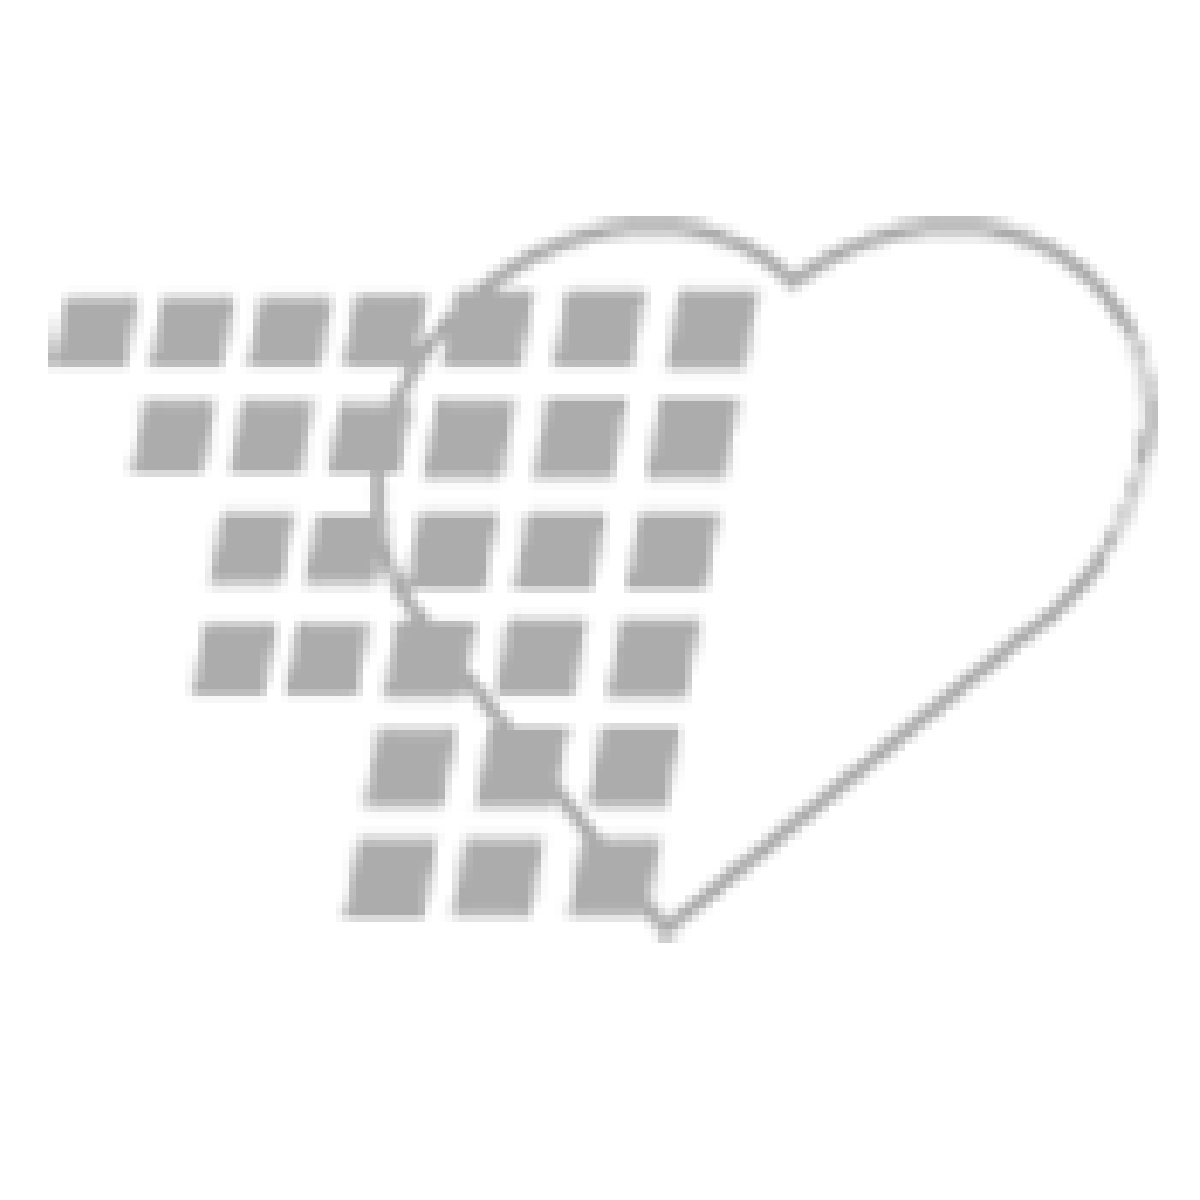 02-80-2167 - Ultrascope® Teaching Stethoscopes - Stick Nurse